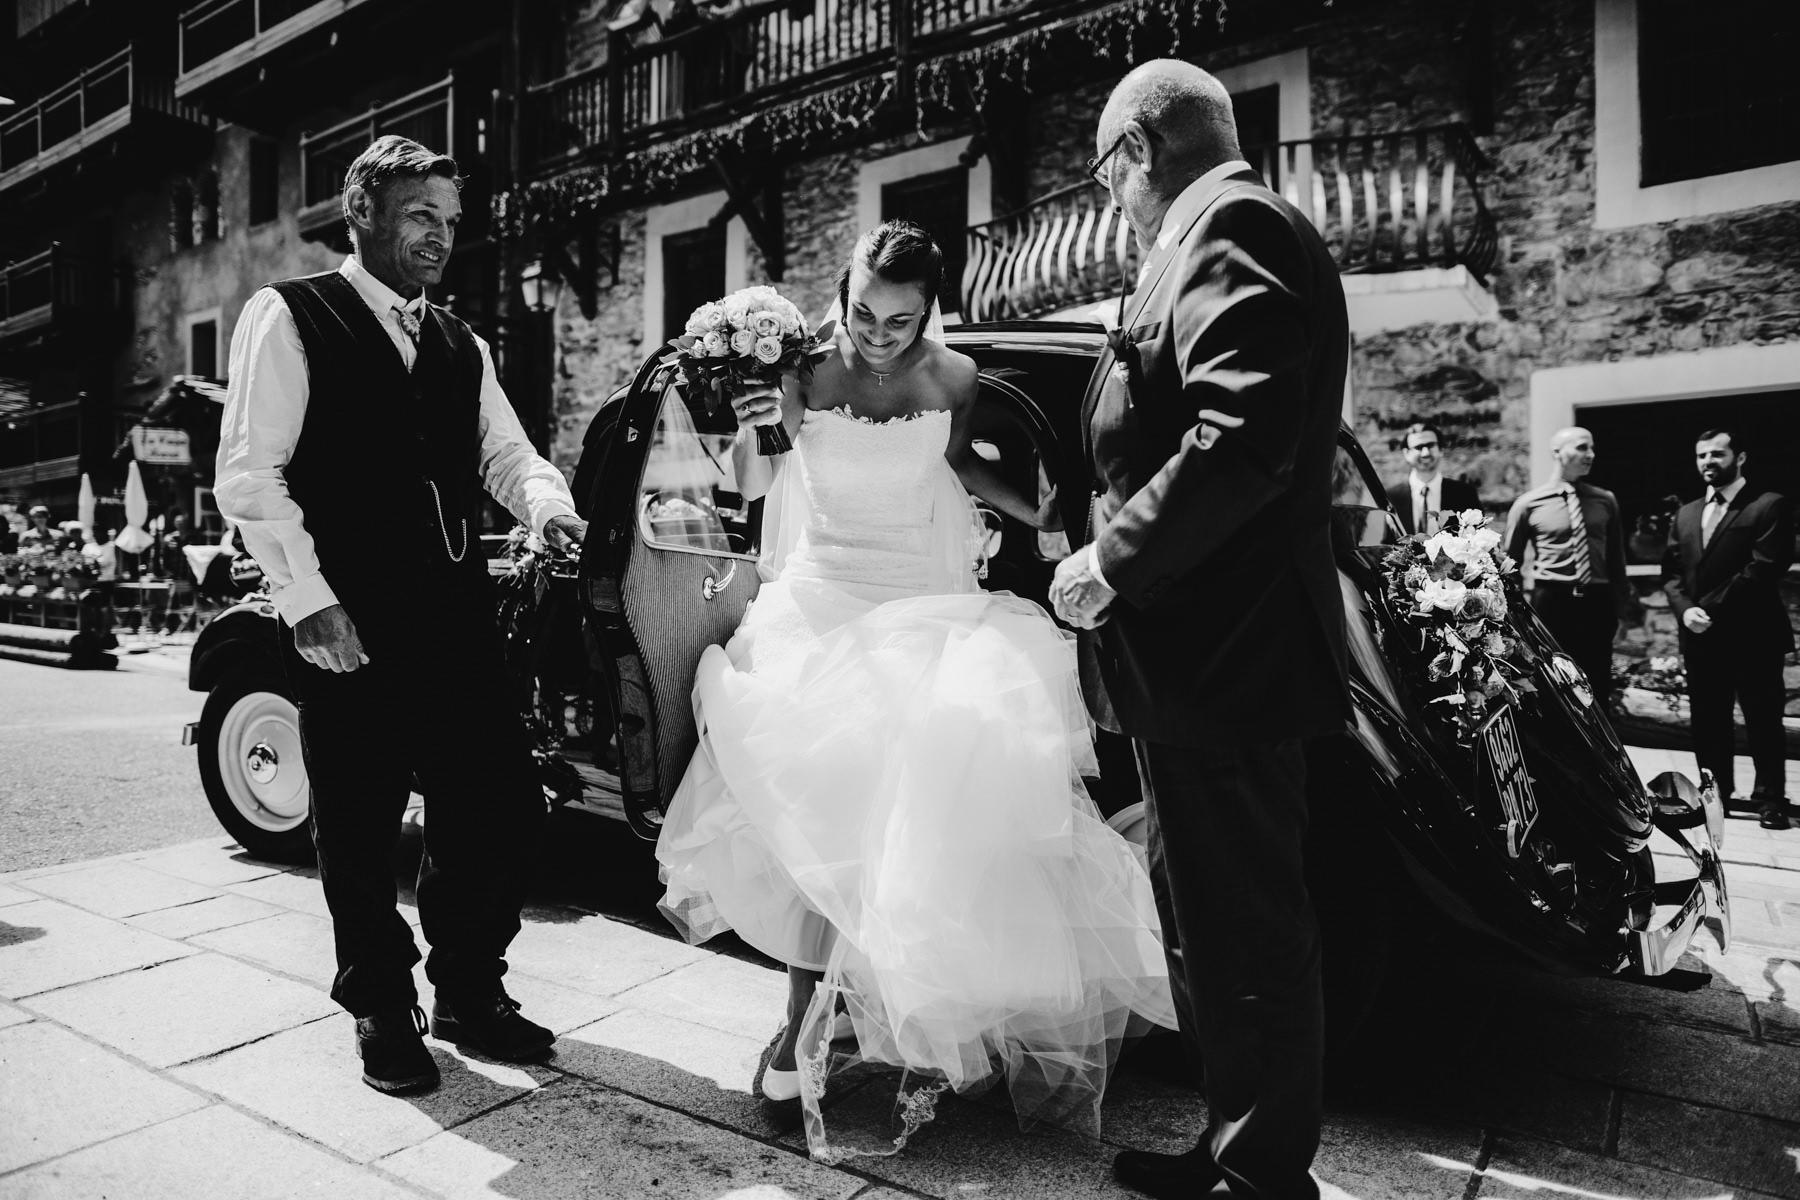 narracia-wygledacz-photographe-mariage-portfolio-54.jpg